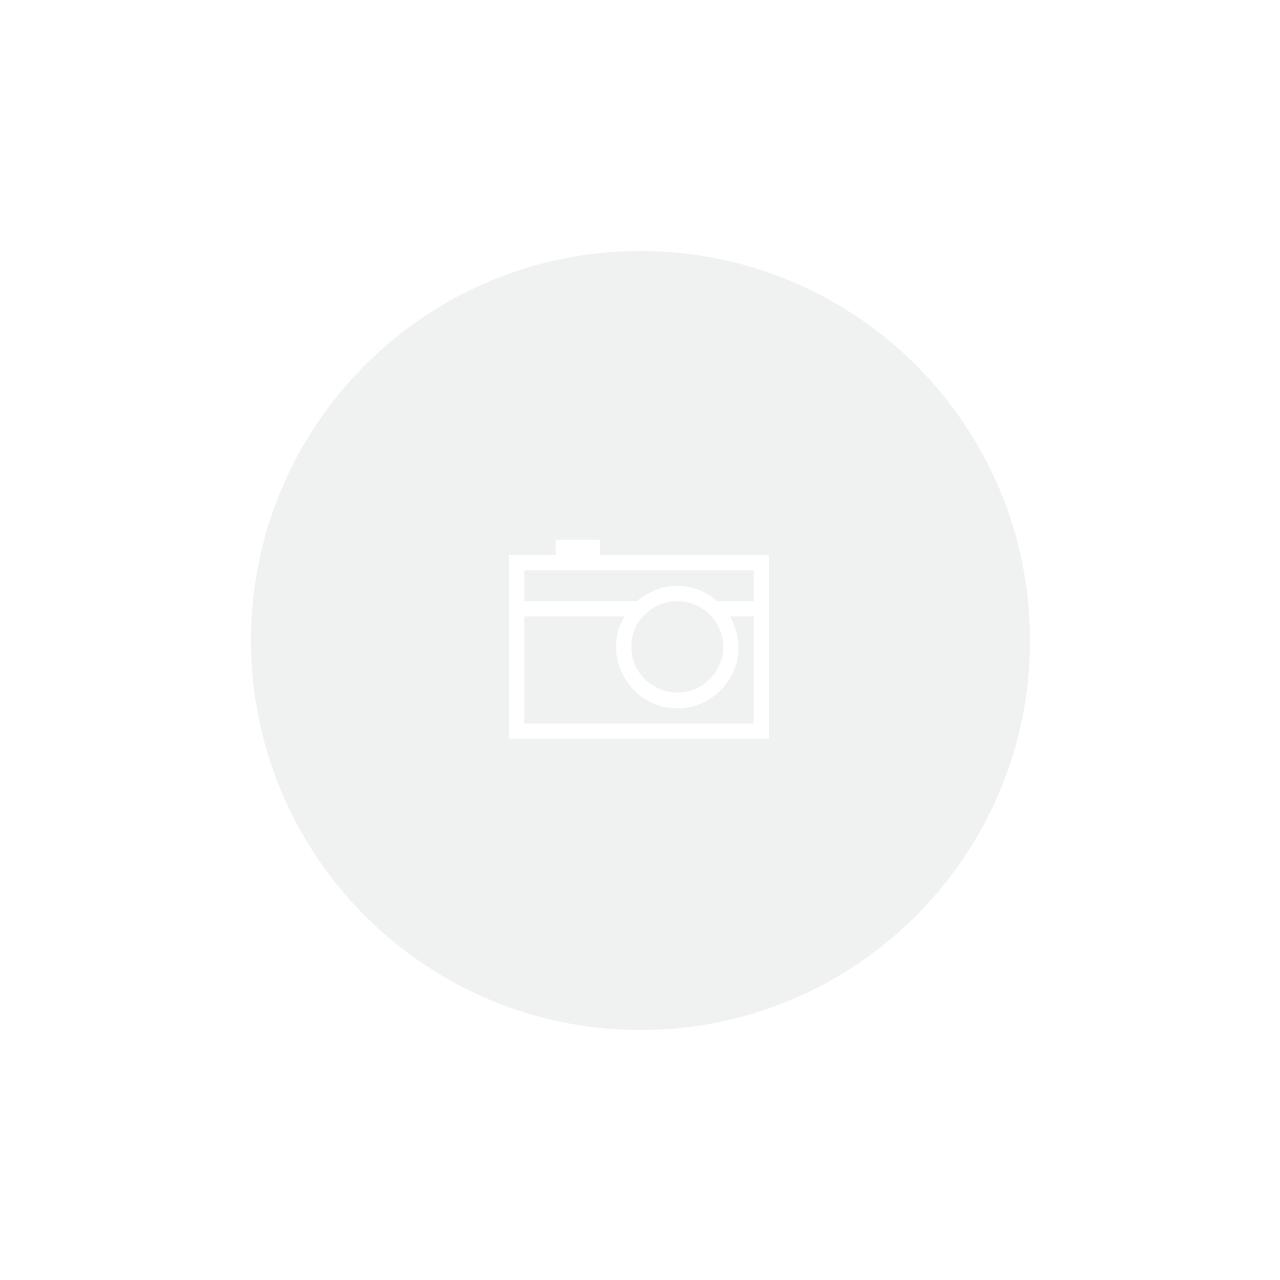 Caçarola Funda Inox Ø20Cm Professional Tramontina